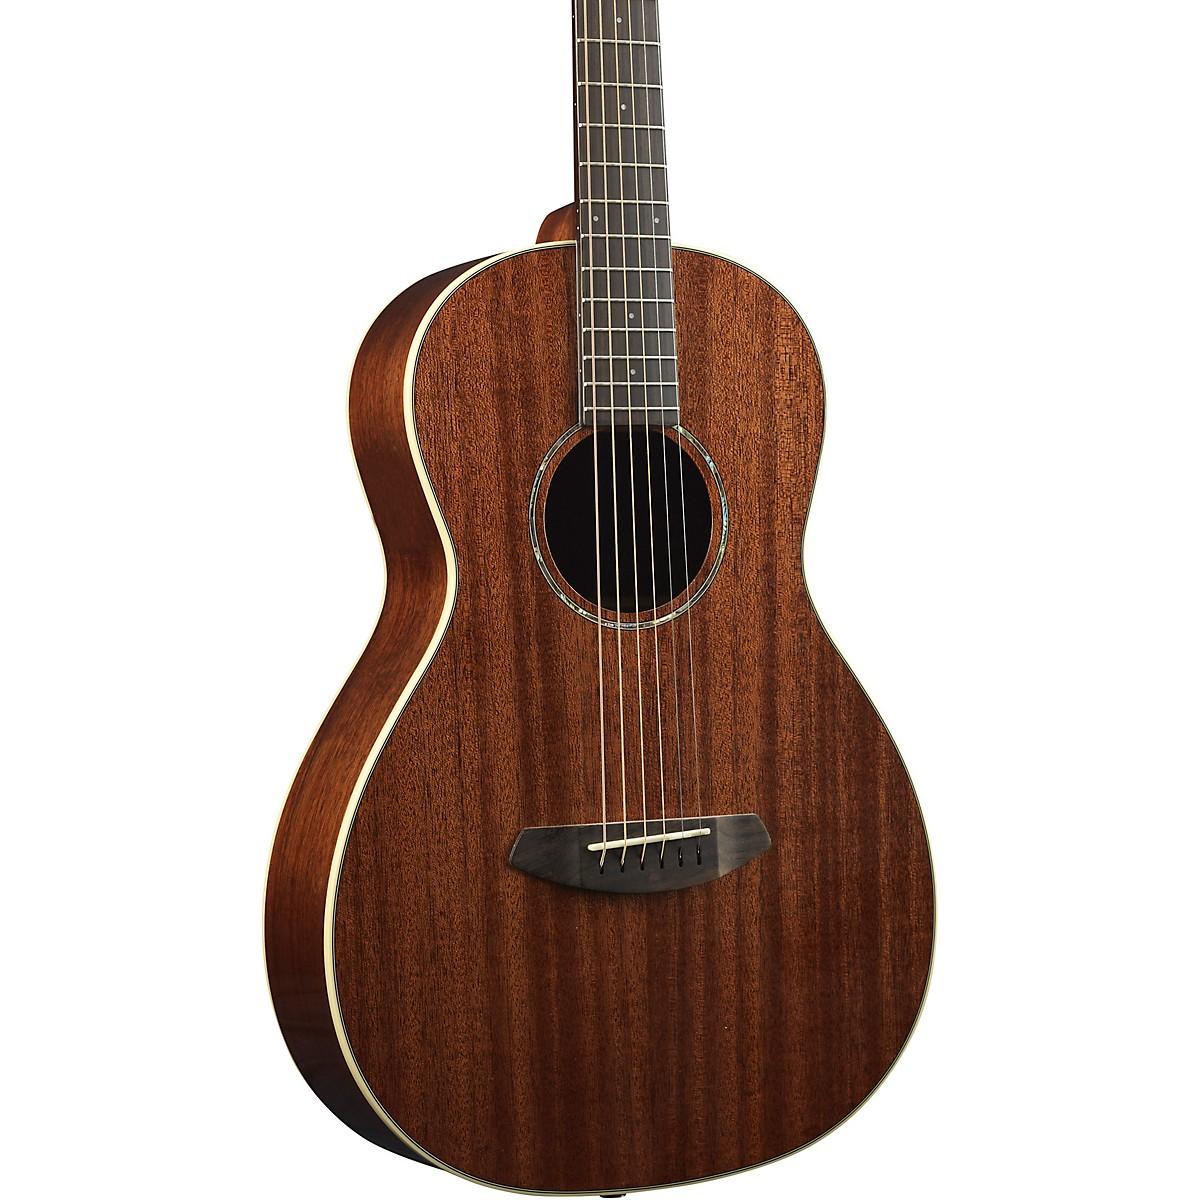 Breedlove Pursuit Parlor with Sapele Top Acoustic-Electric Guitar